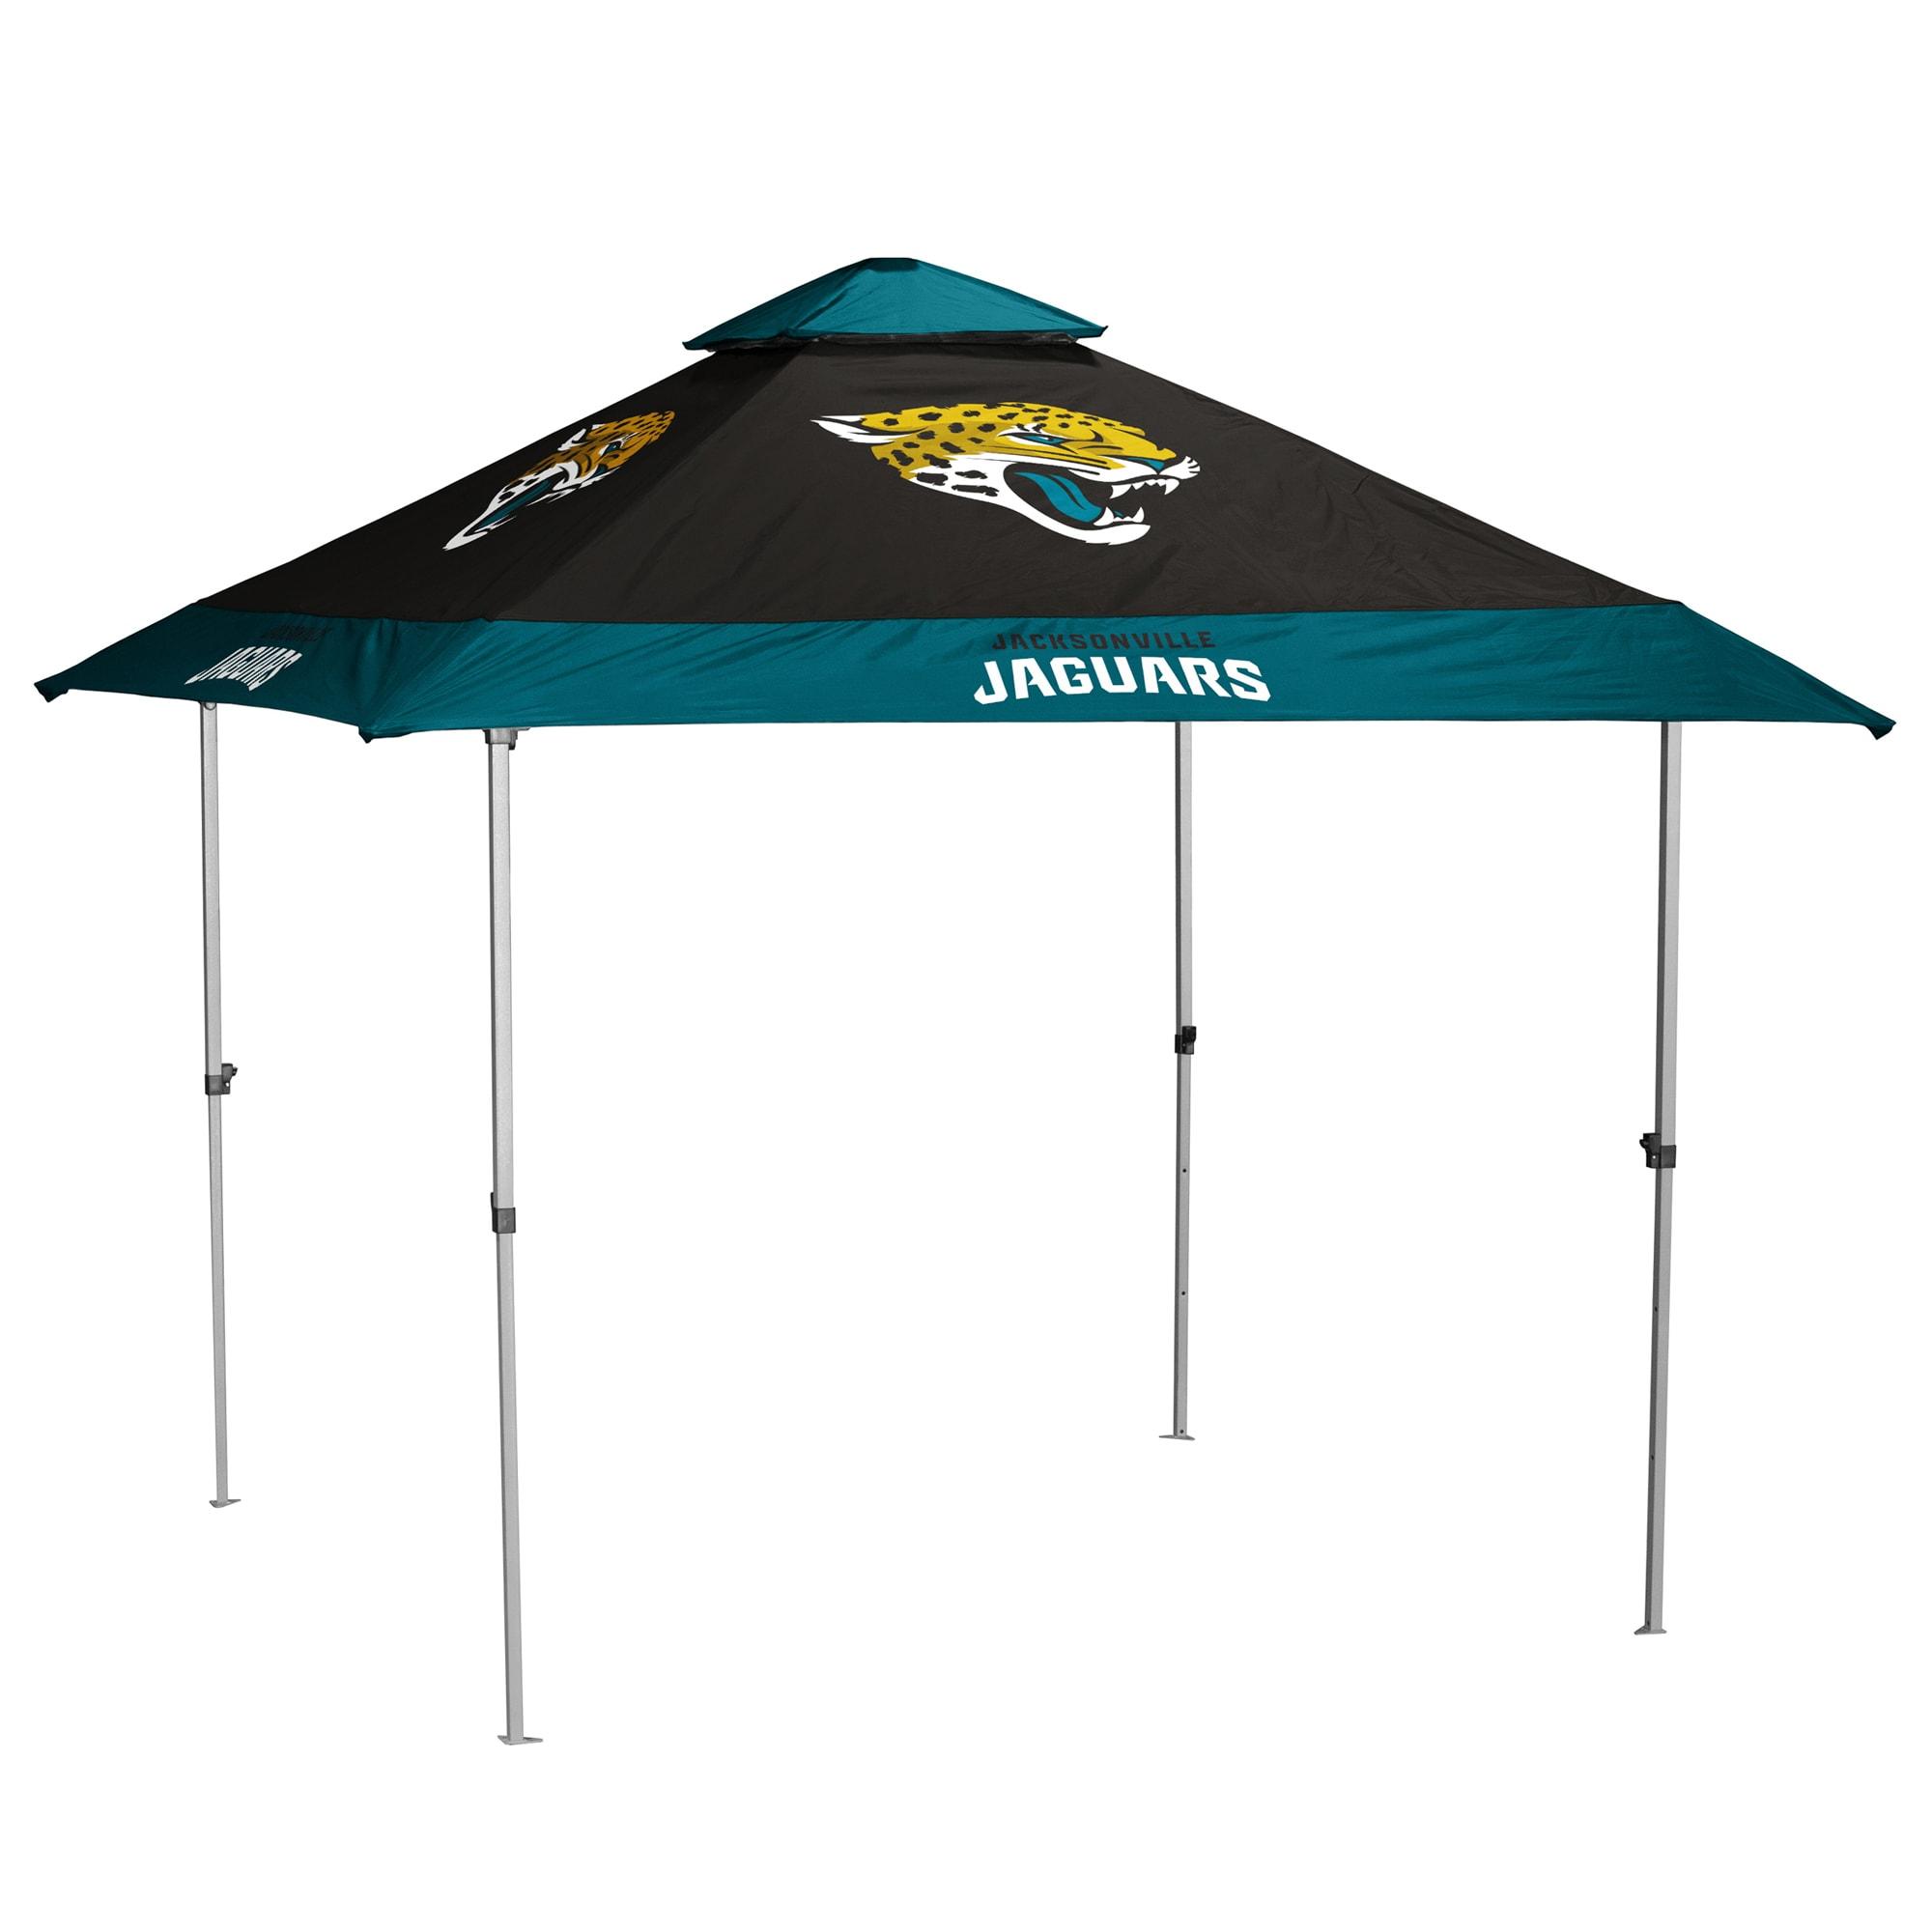 Jacksonville Jaguars 9' x 9' Pagoda Tailgate Canopy Tent